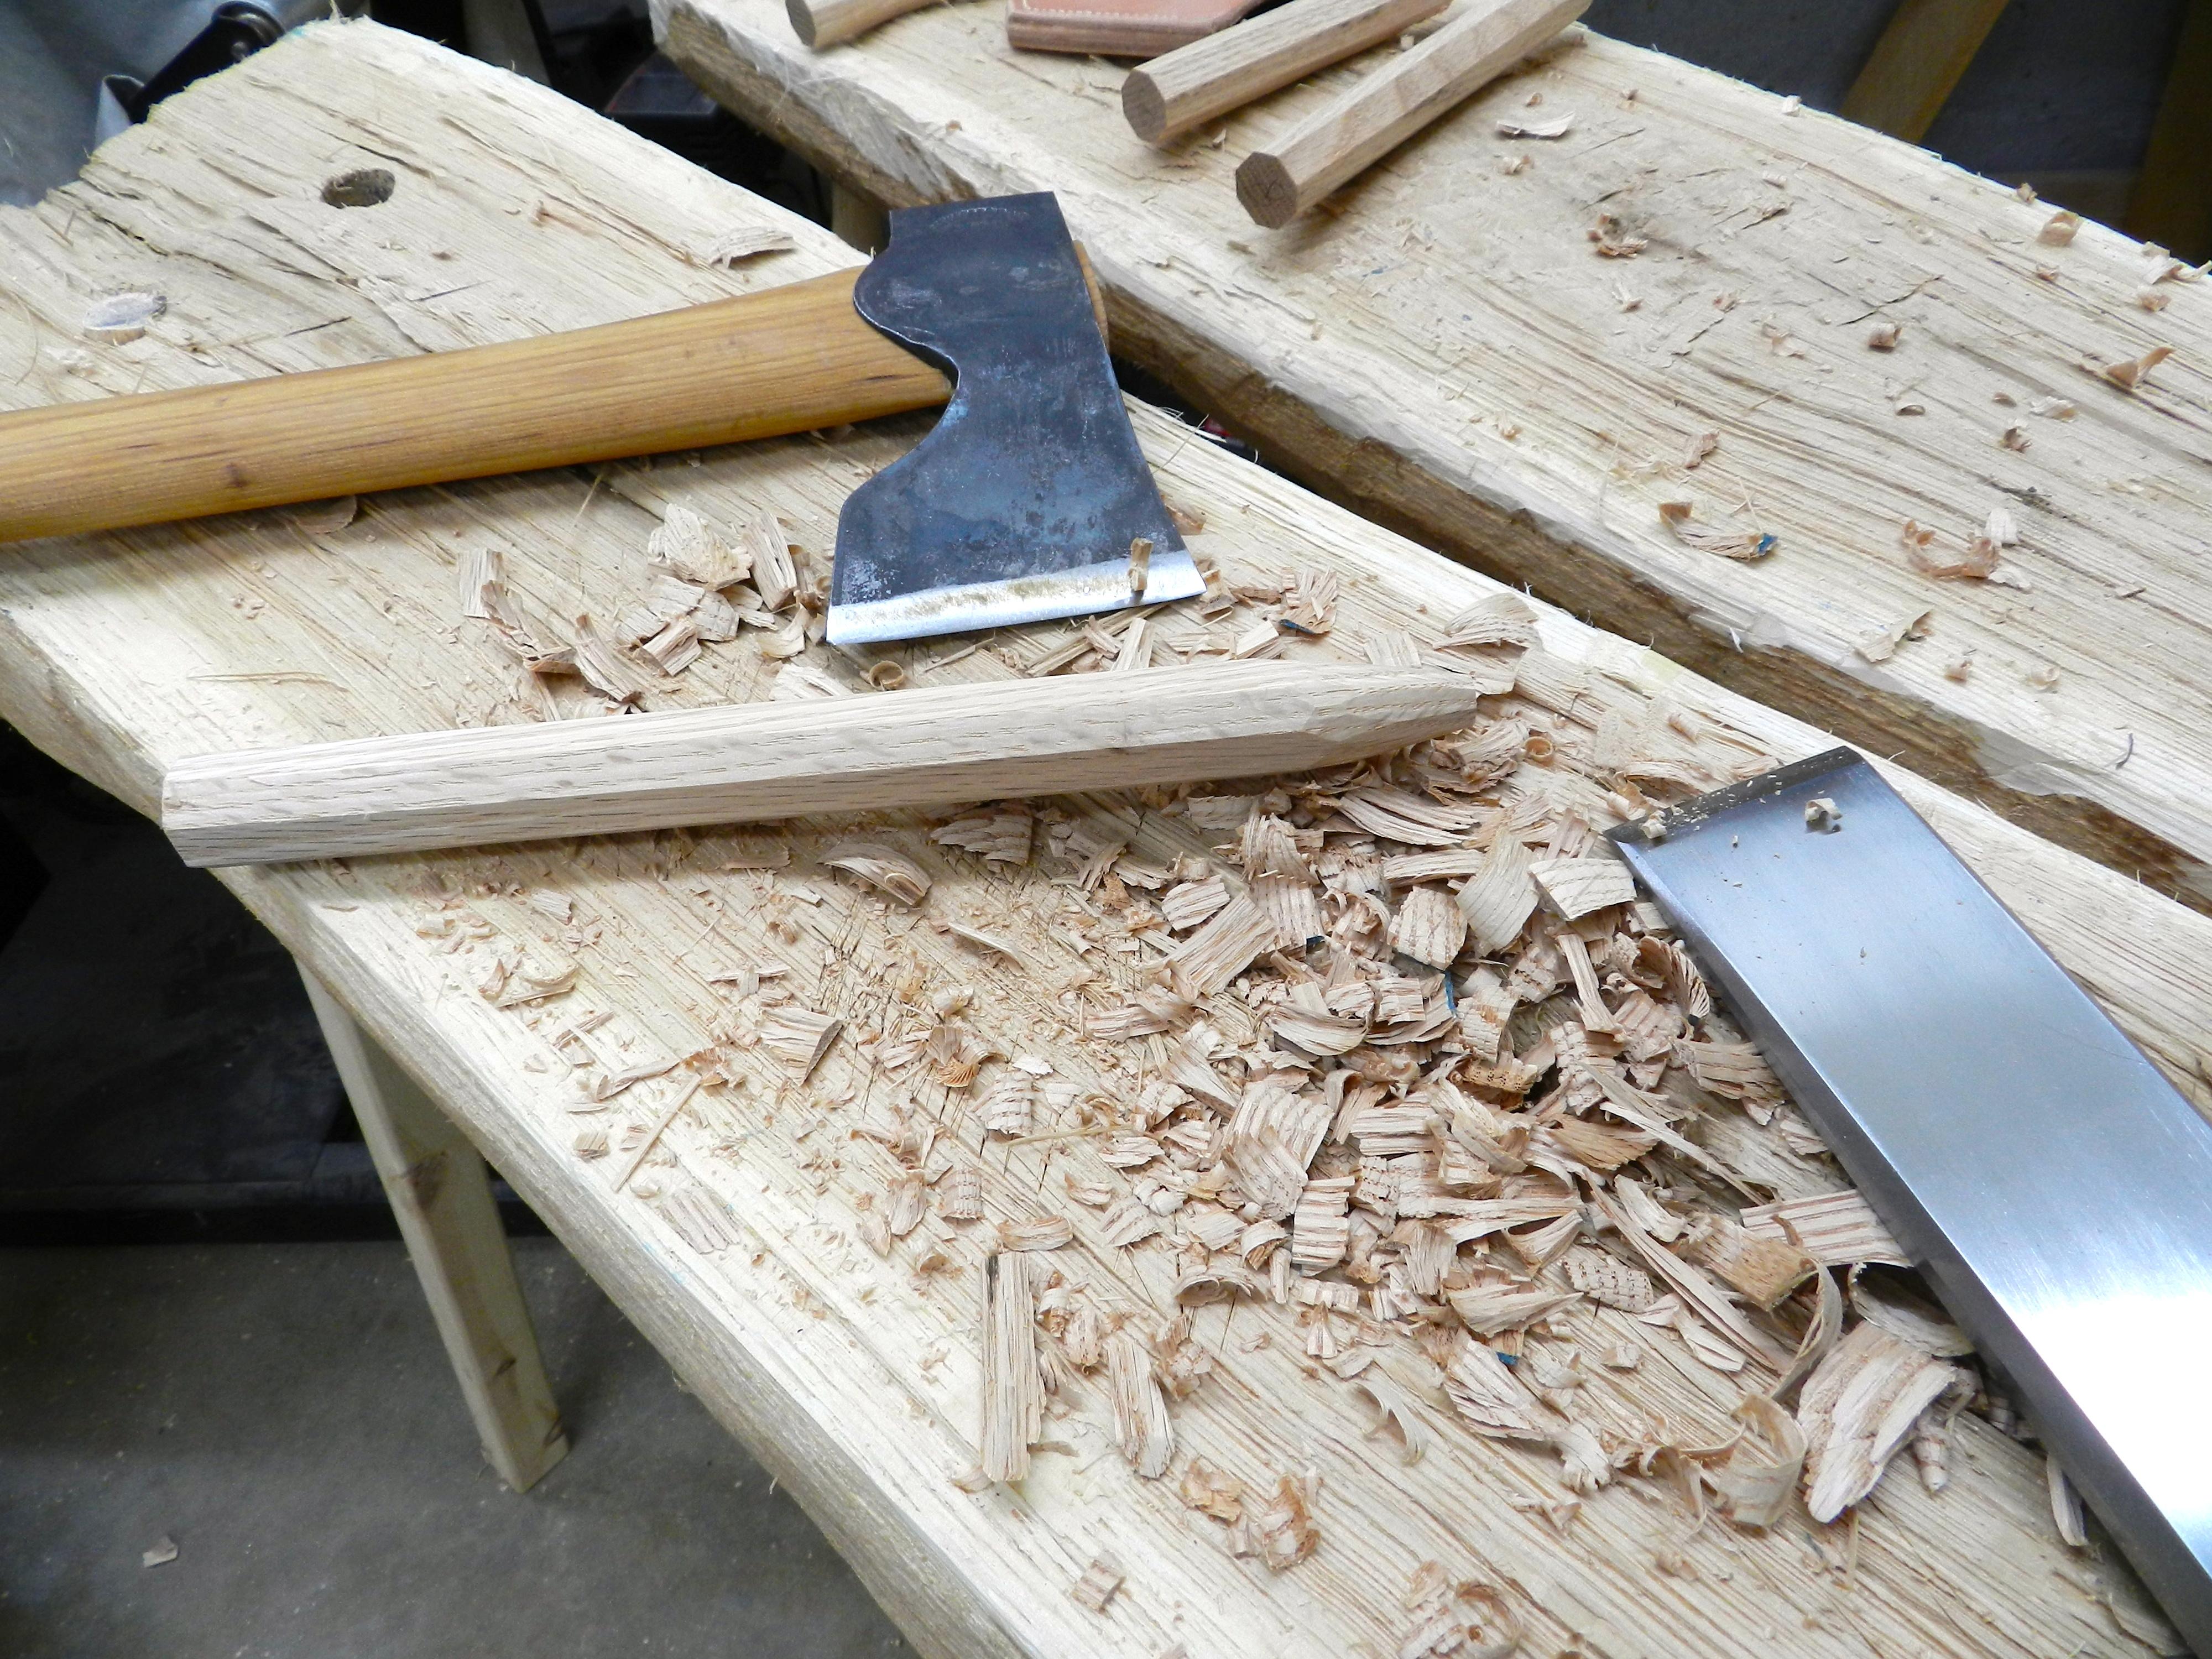 Treenails, Trunnels, Pins and Pegs | Rainford Restorations